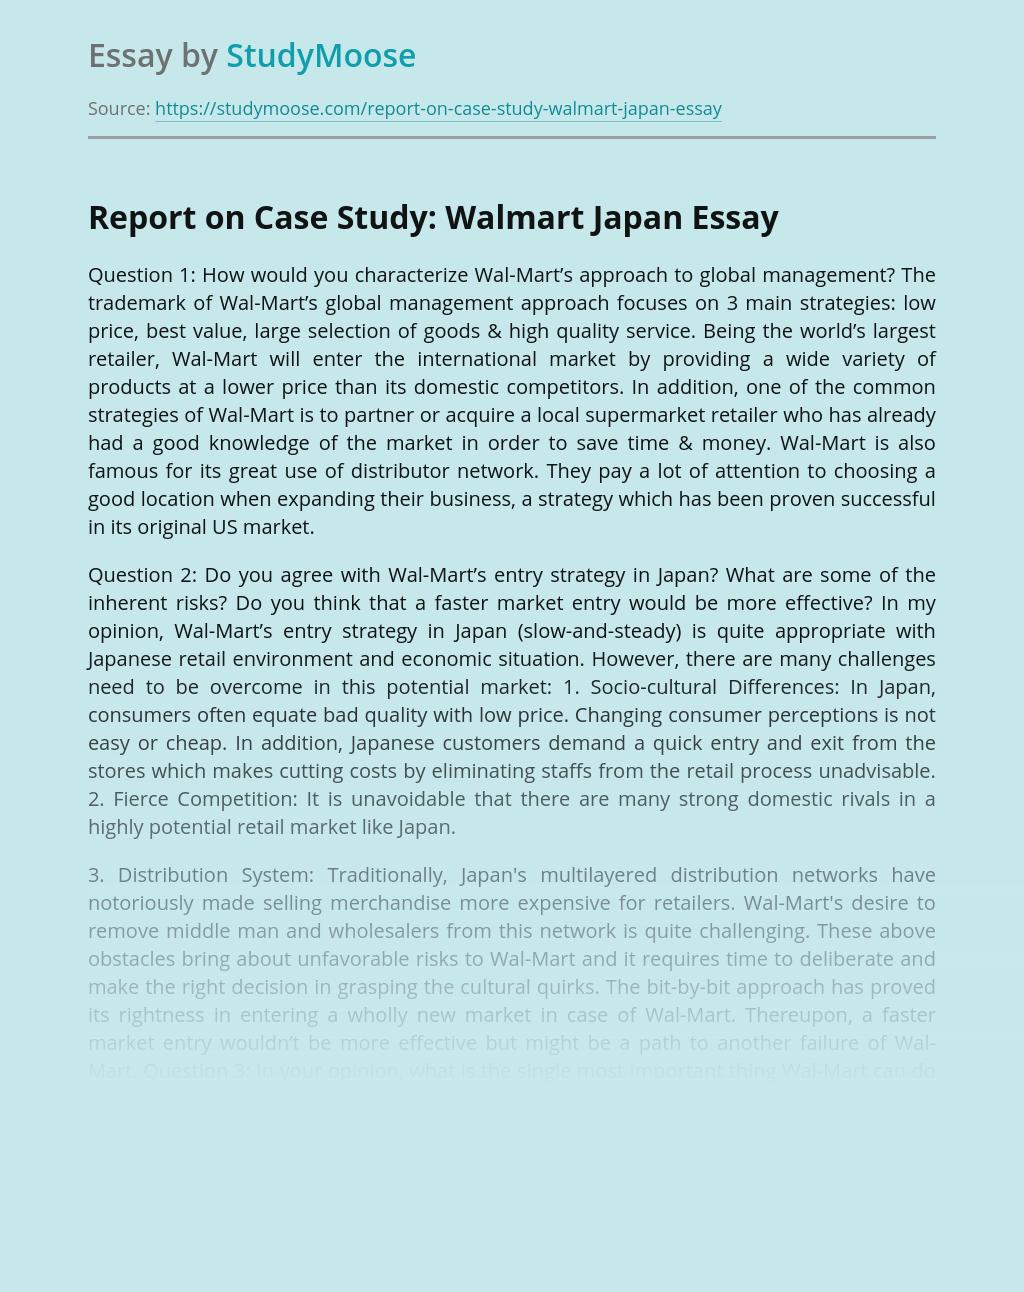 Report on Case Study: Walmart Japan